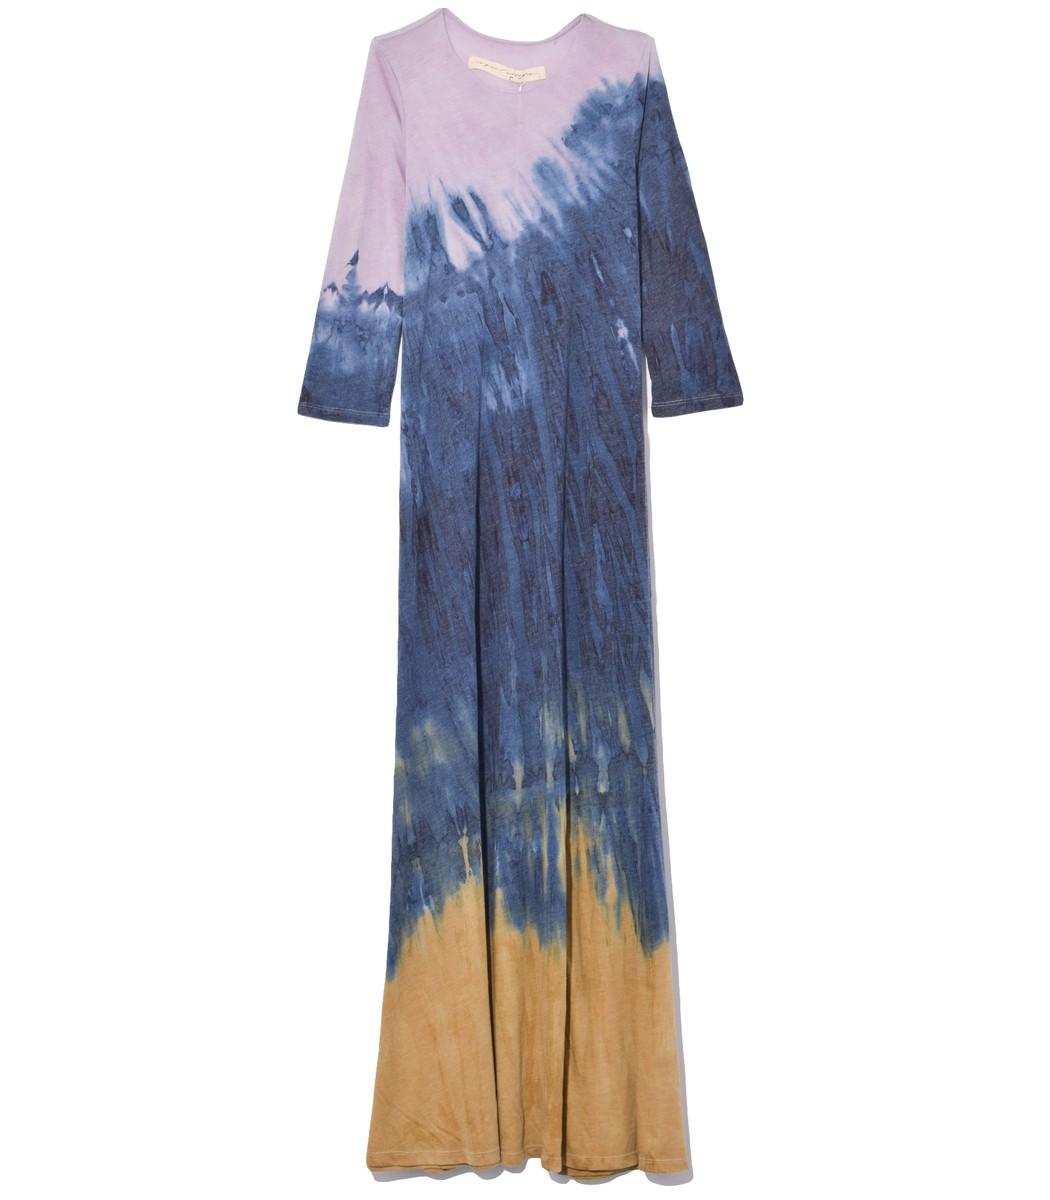 Raquel Allegra Half Sleeve Drama Maxi Dress in Gold Rainbow